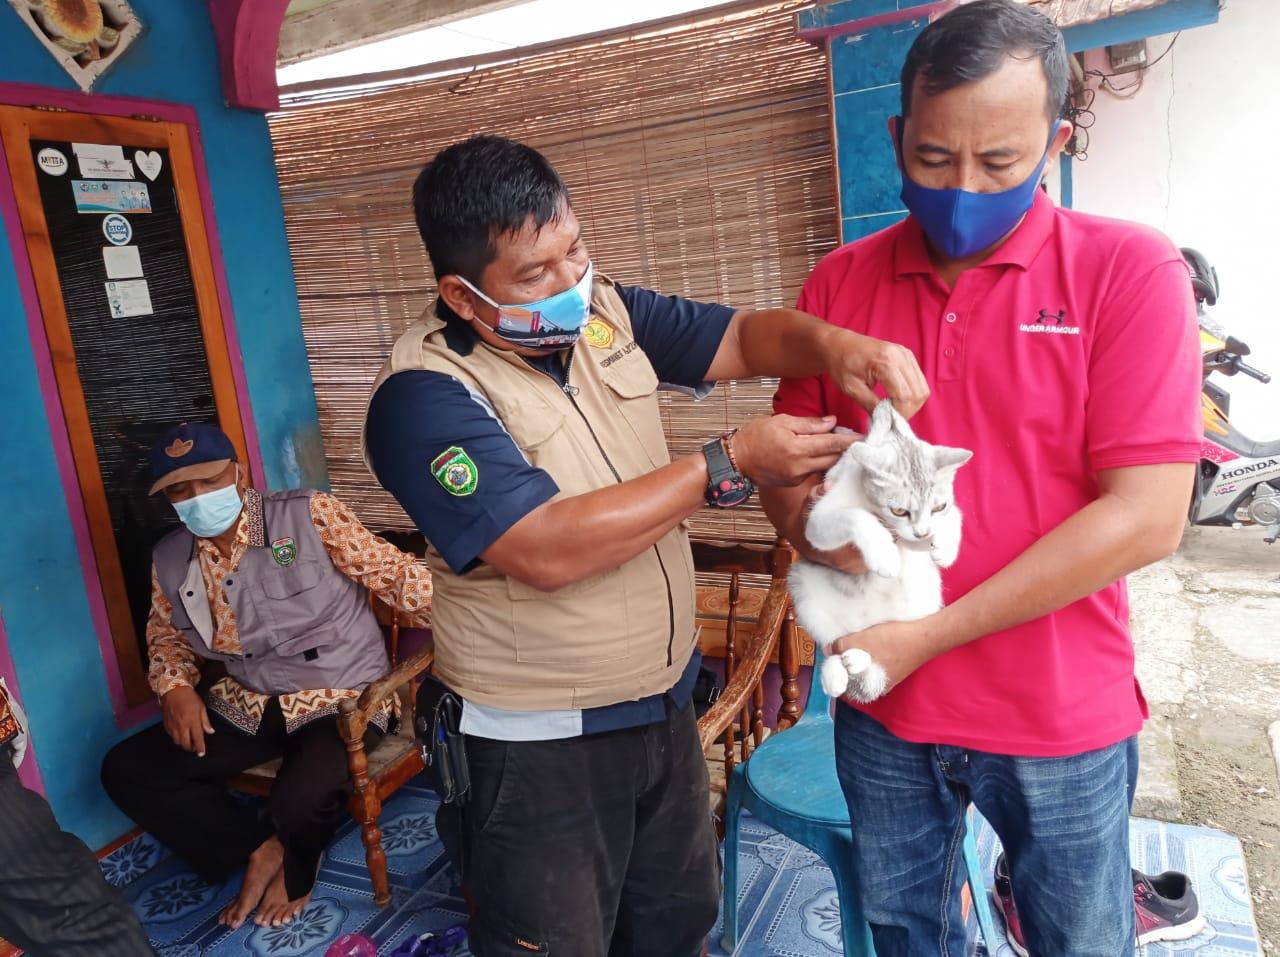 Program rutin Dinas Pertanian Kota Prabumulih melaui Bidang Peternakan dan Kesehatan Hewan,melakukan penyuntikan vaksin anti rabies terhadap hewan peliharaan seperti Kucing, Anjing dan Monyet.